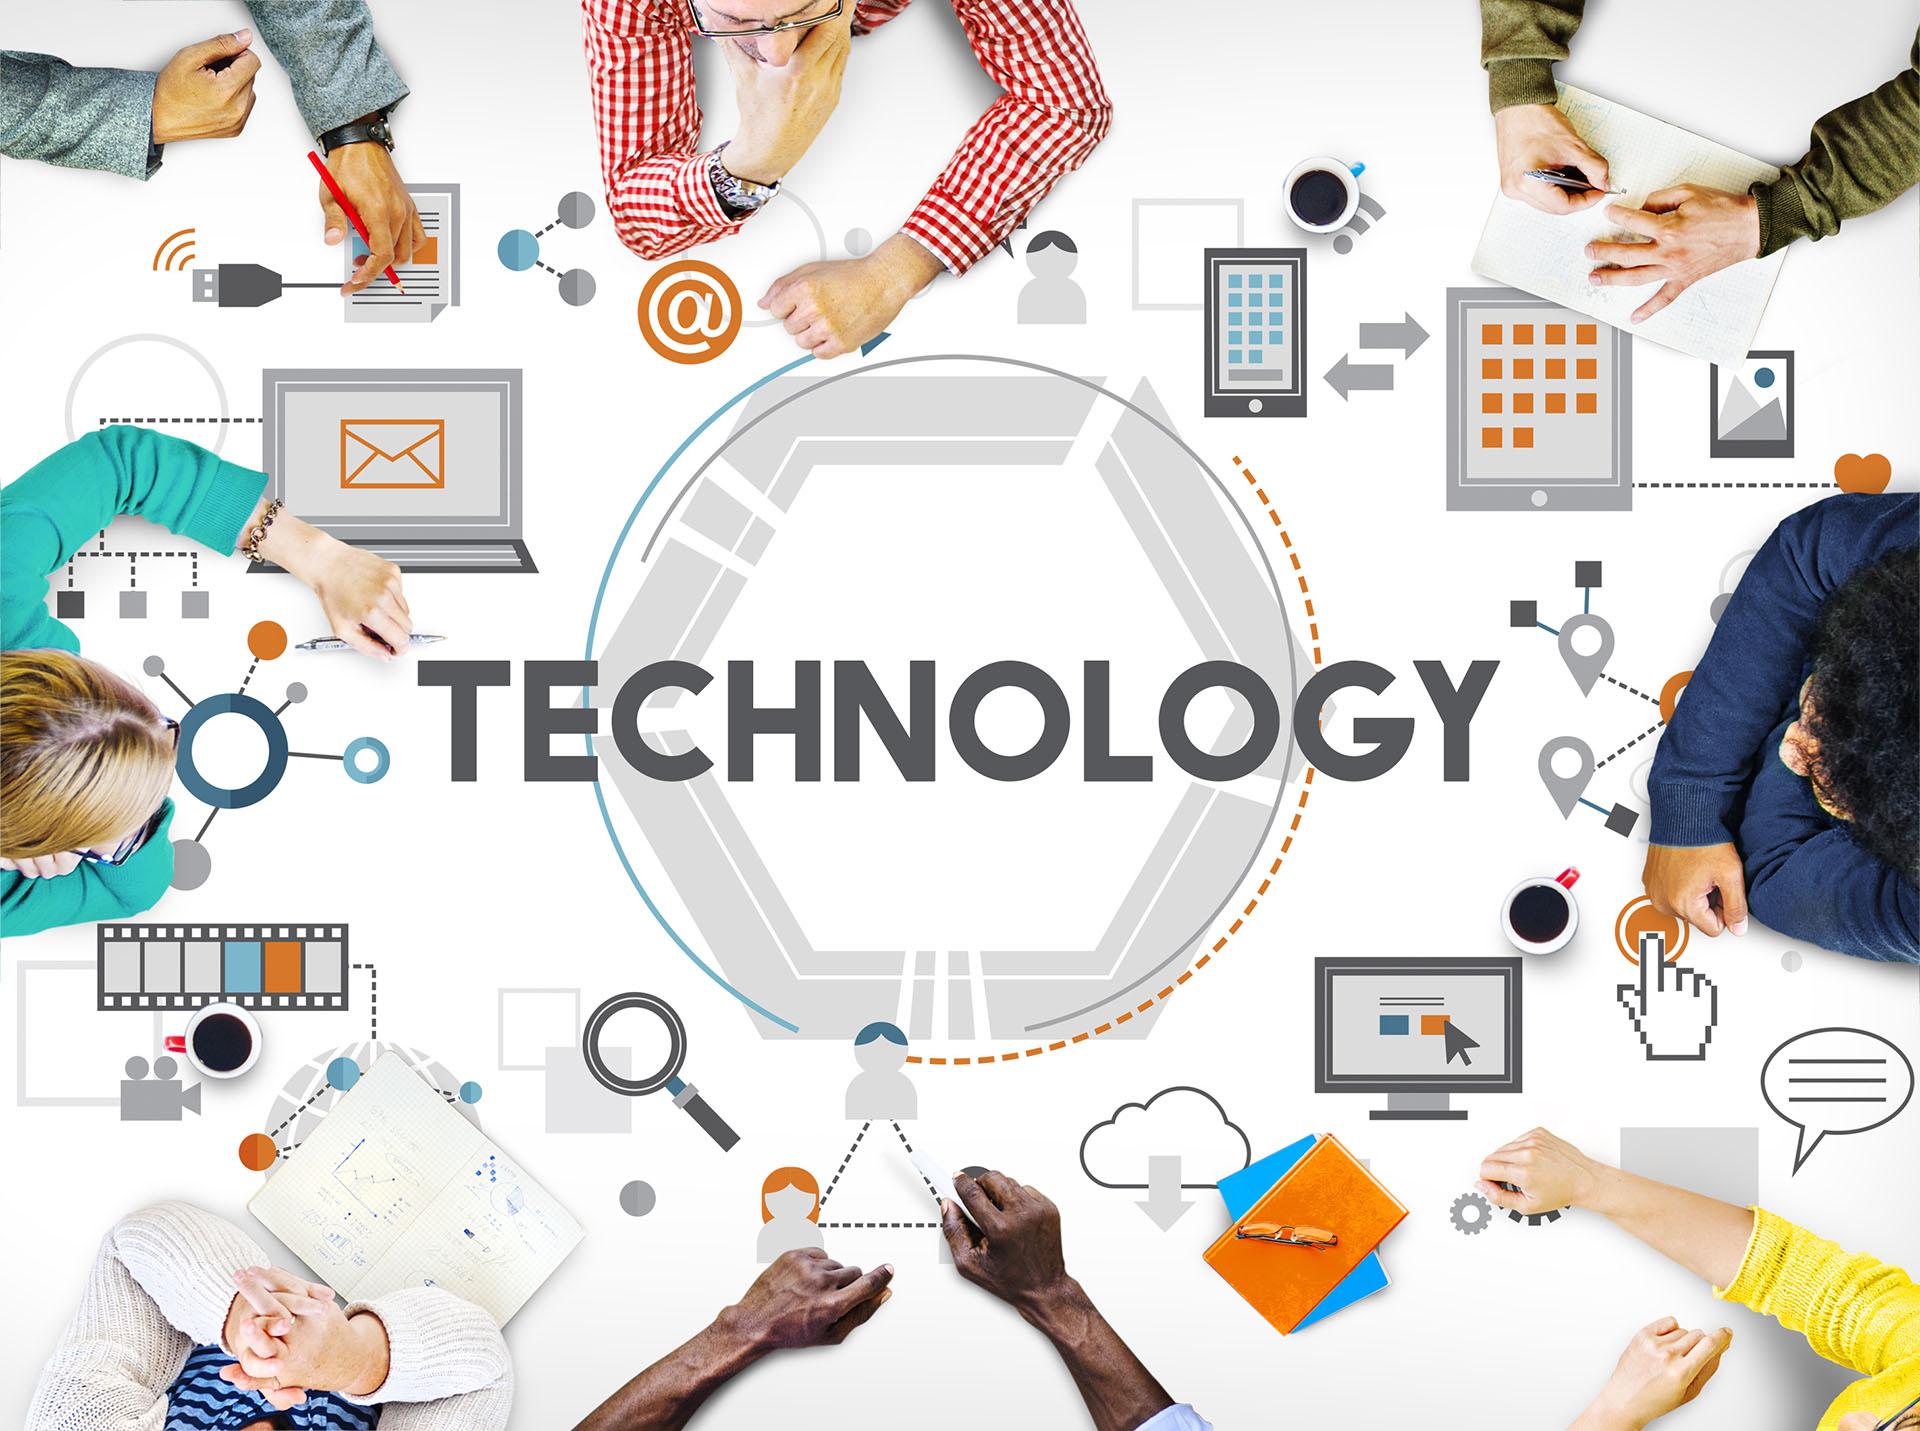 Technology Innovation Concept